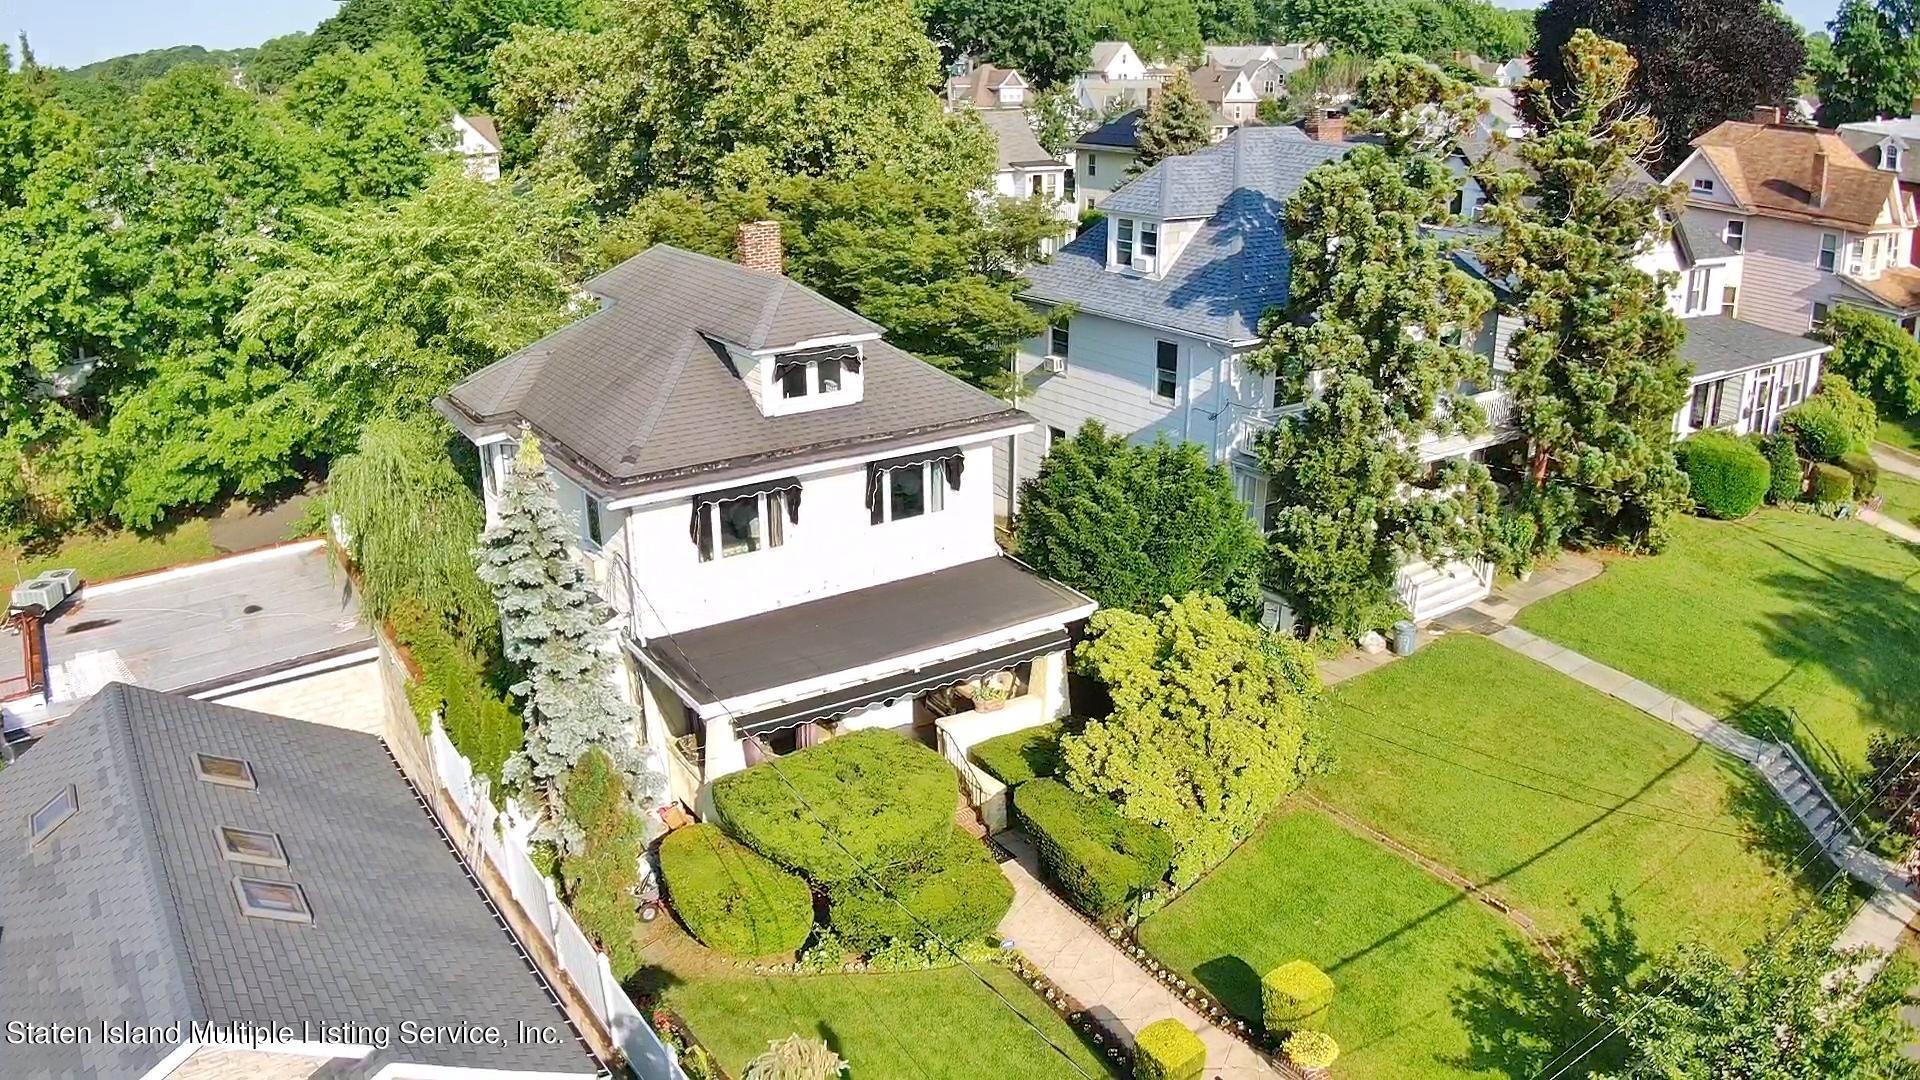 Single Family - Detached 311 Bement Avenue  Staten Island, NY 10310, MLS-1147133-3